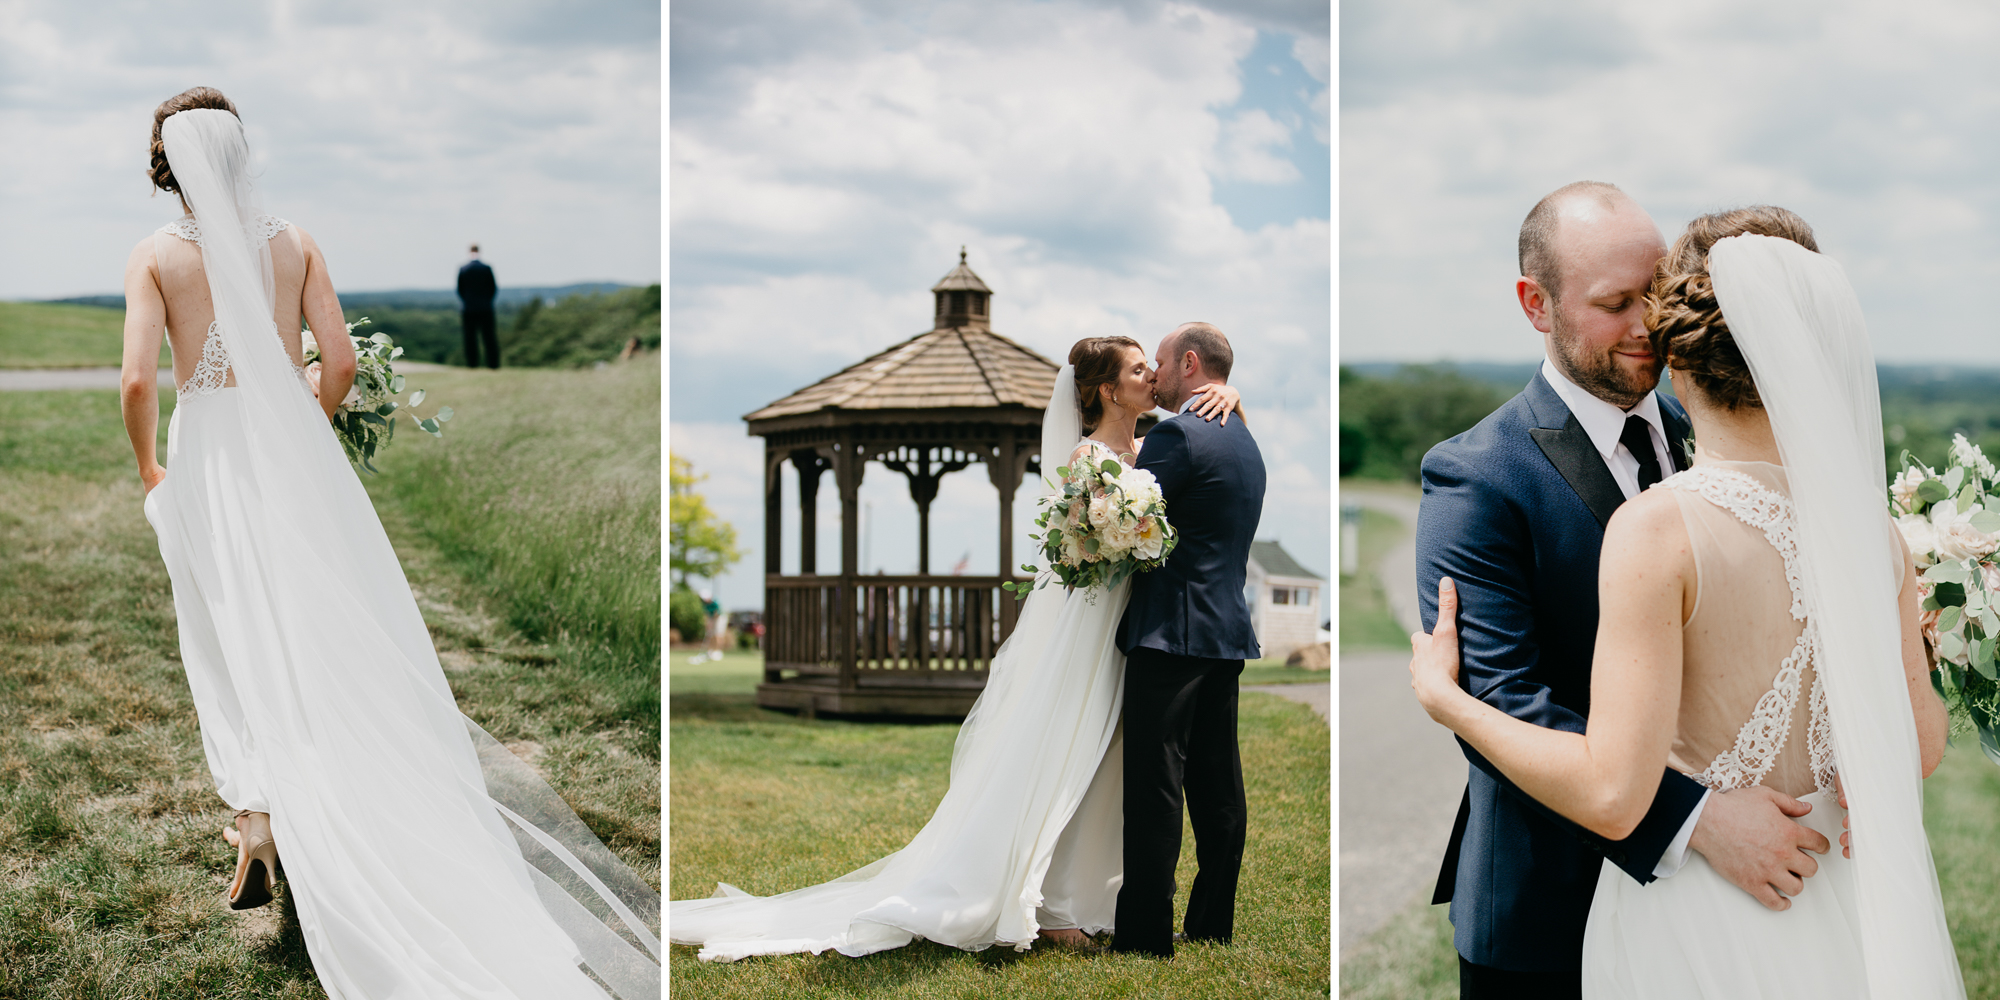 Jaclyn_Andrew_quincy_massachusetts_wedding007.jpg